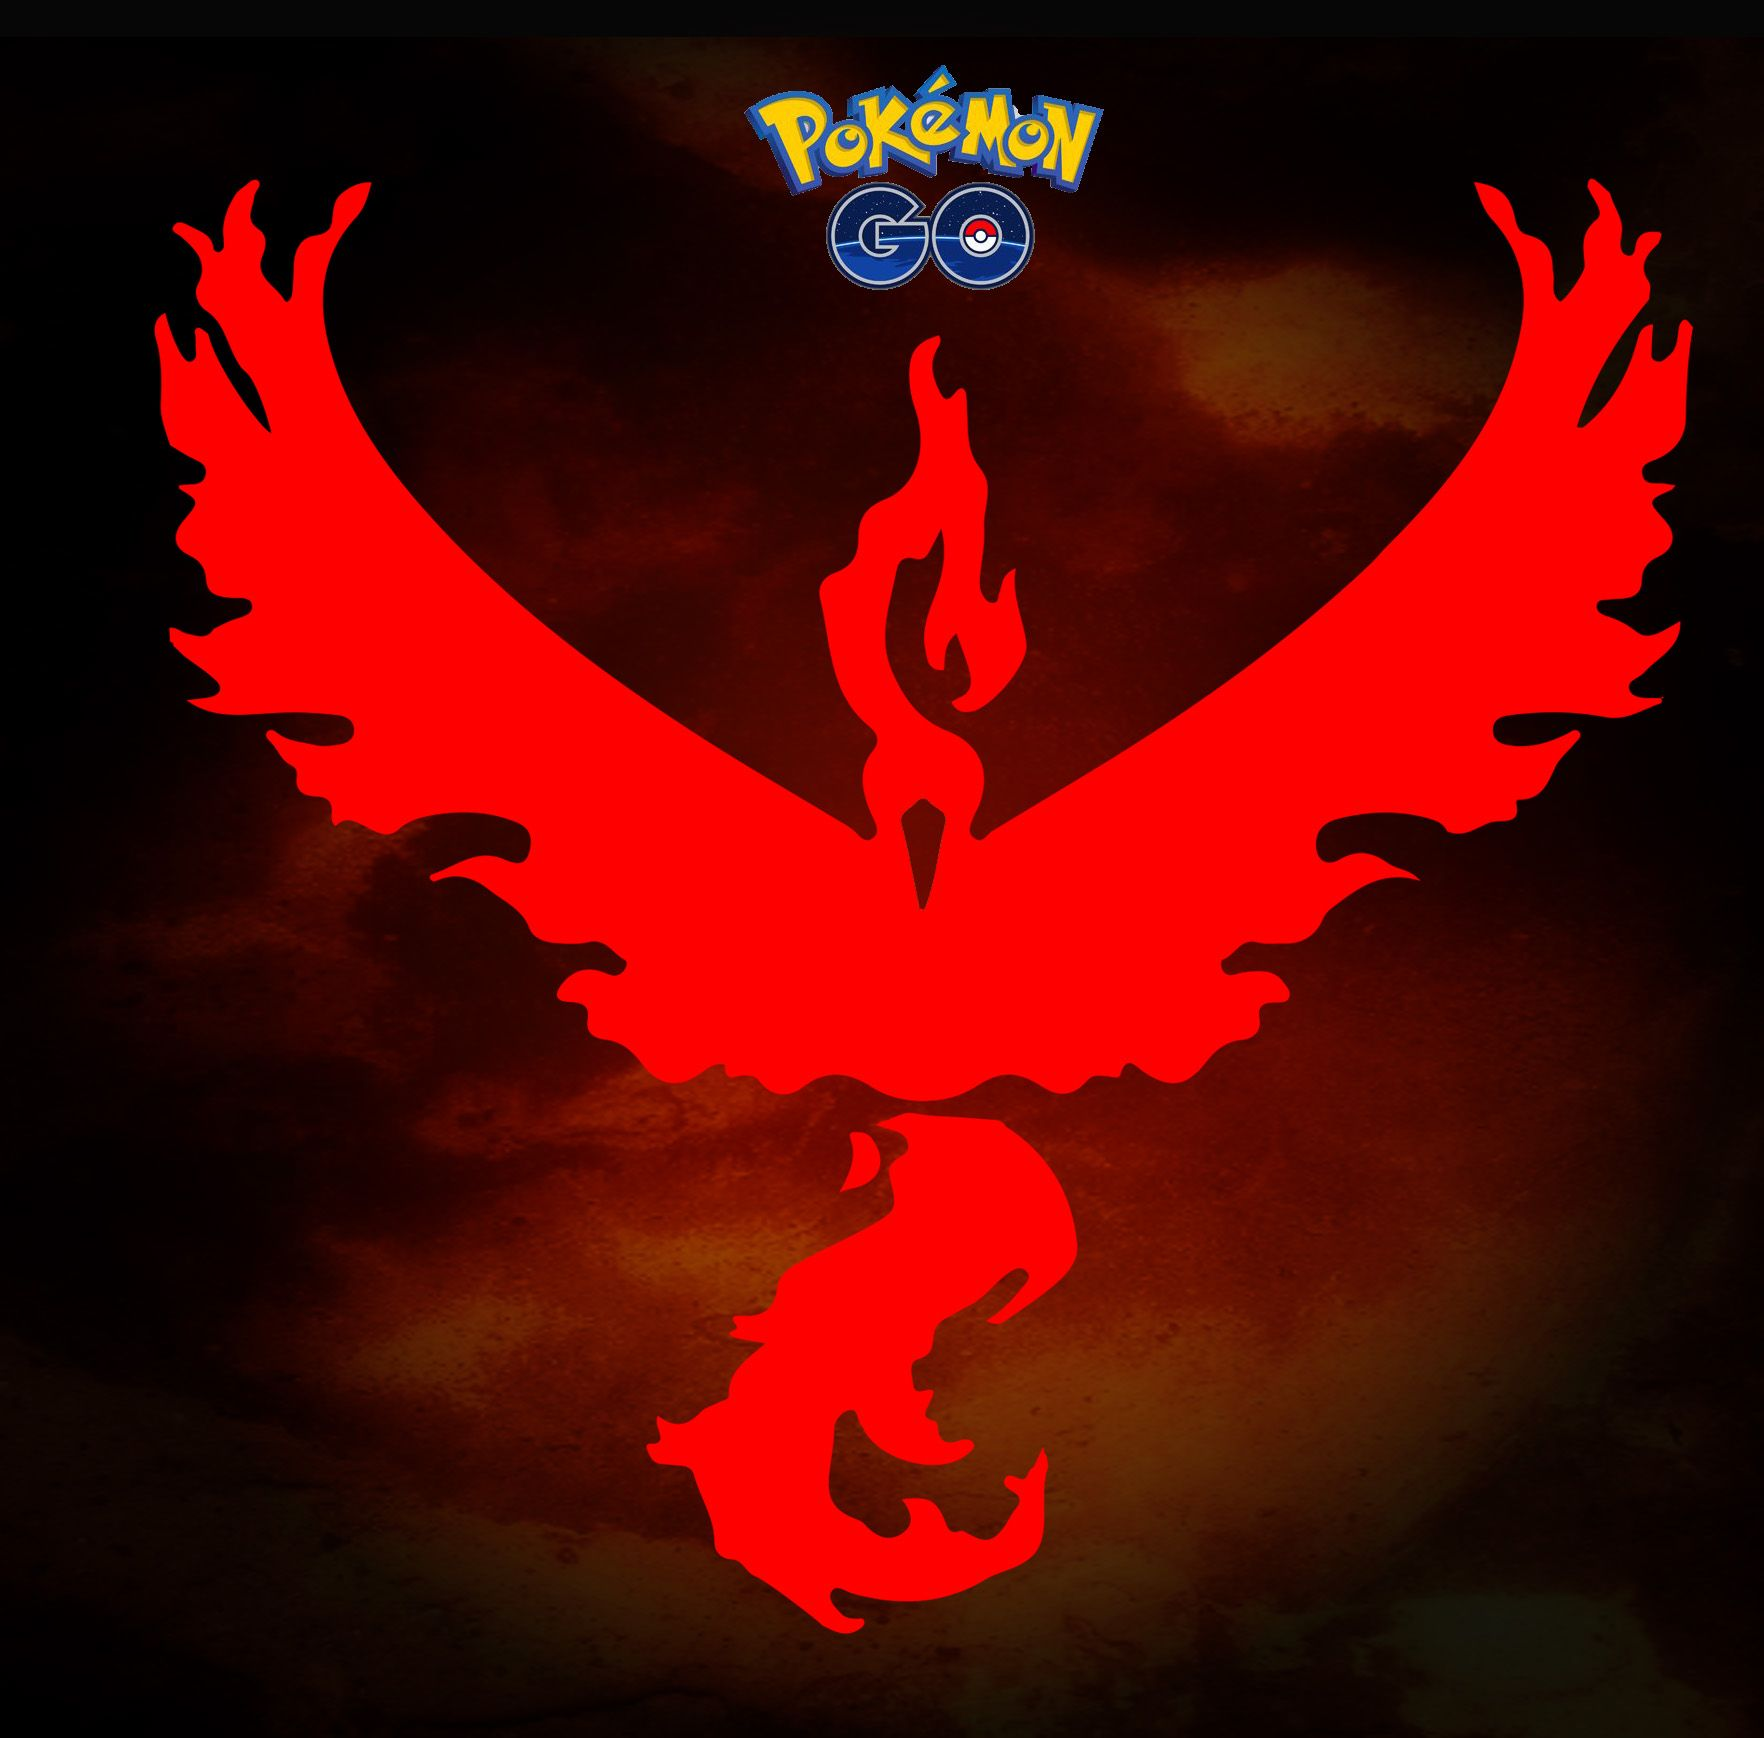 'Pokémon GO' Hype Is Over 9,000! Pokemon, Pokemon go